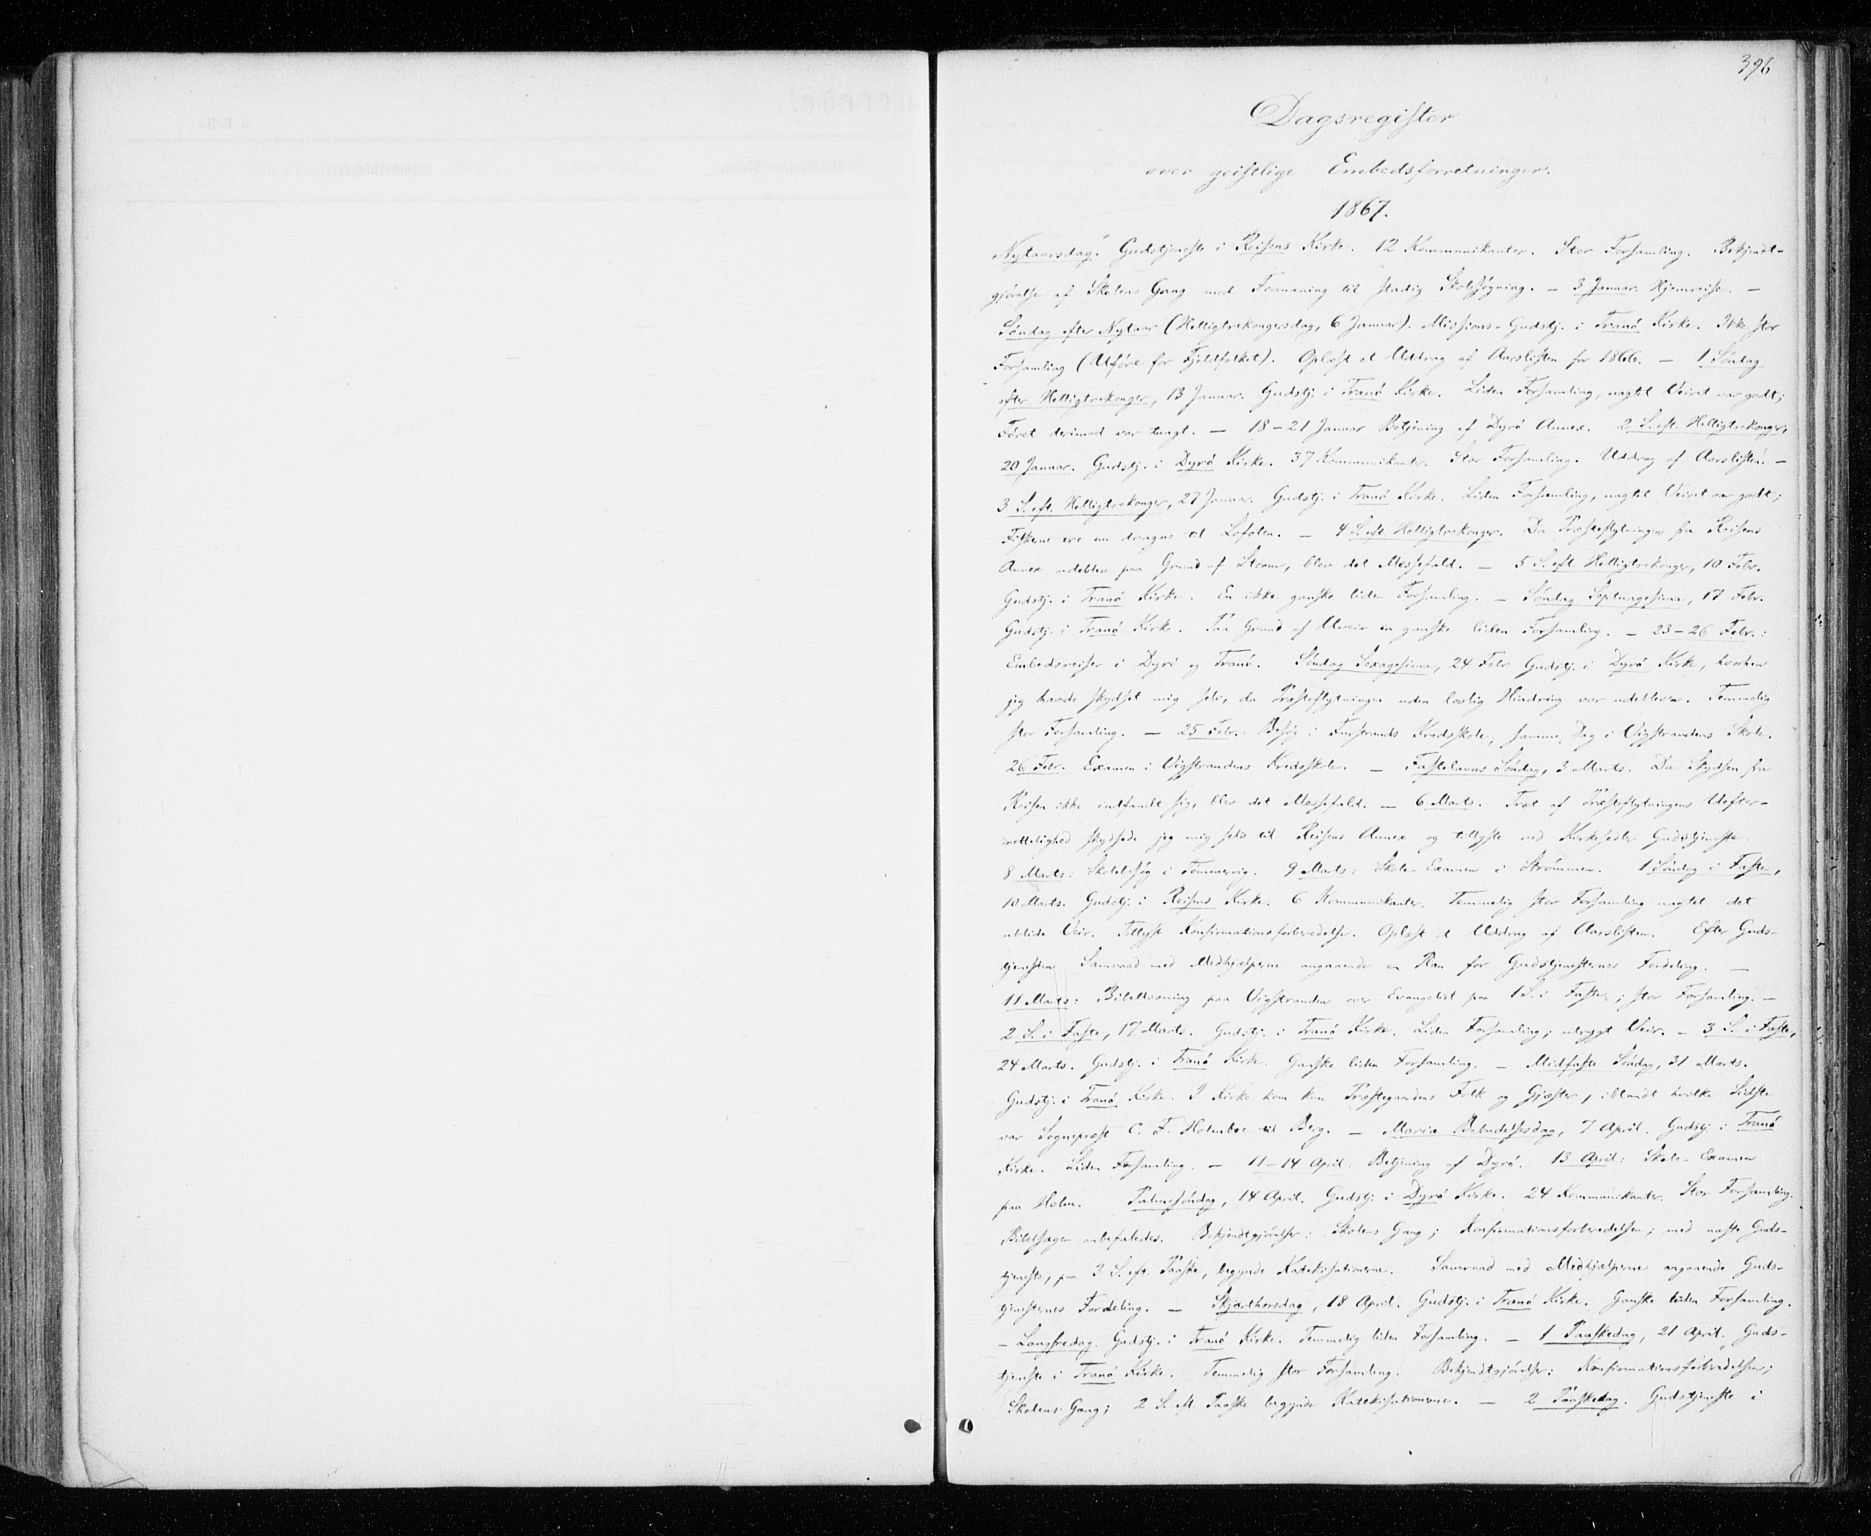 SATØ, Tranøy sokneprestkontor, I/Ia/Iaa/L0008kirke: Ministerialbok nr. 8, 1867-1877, s. 396